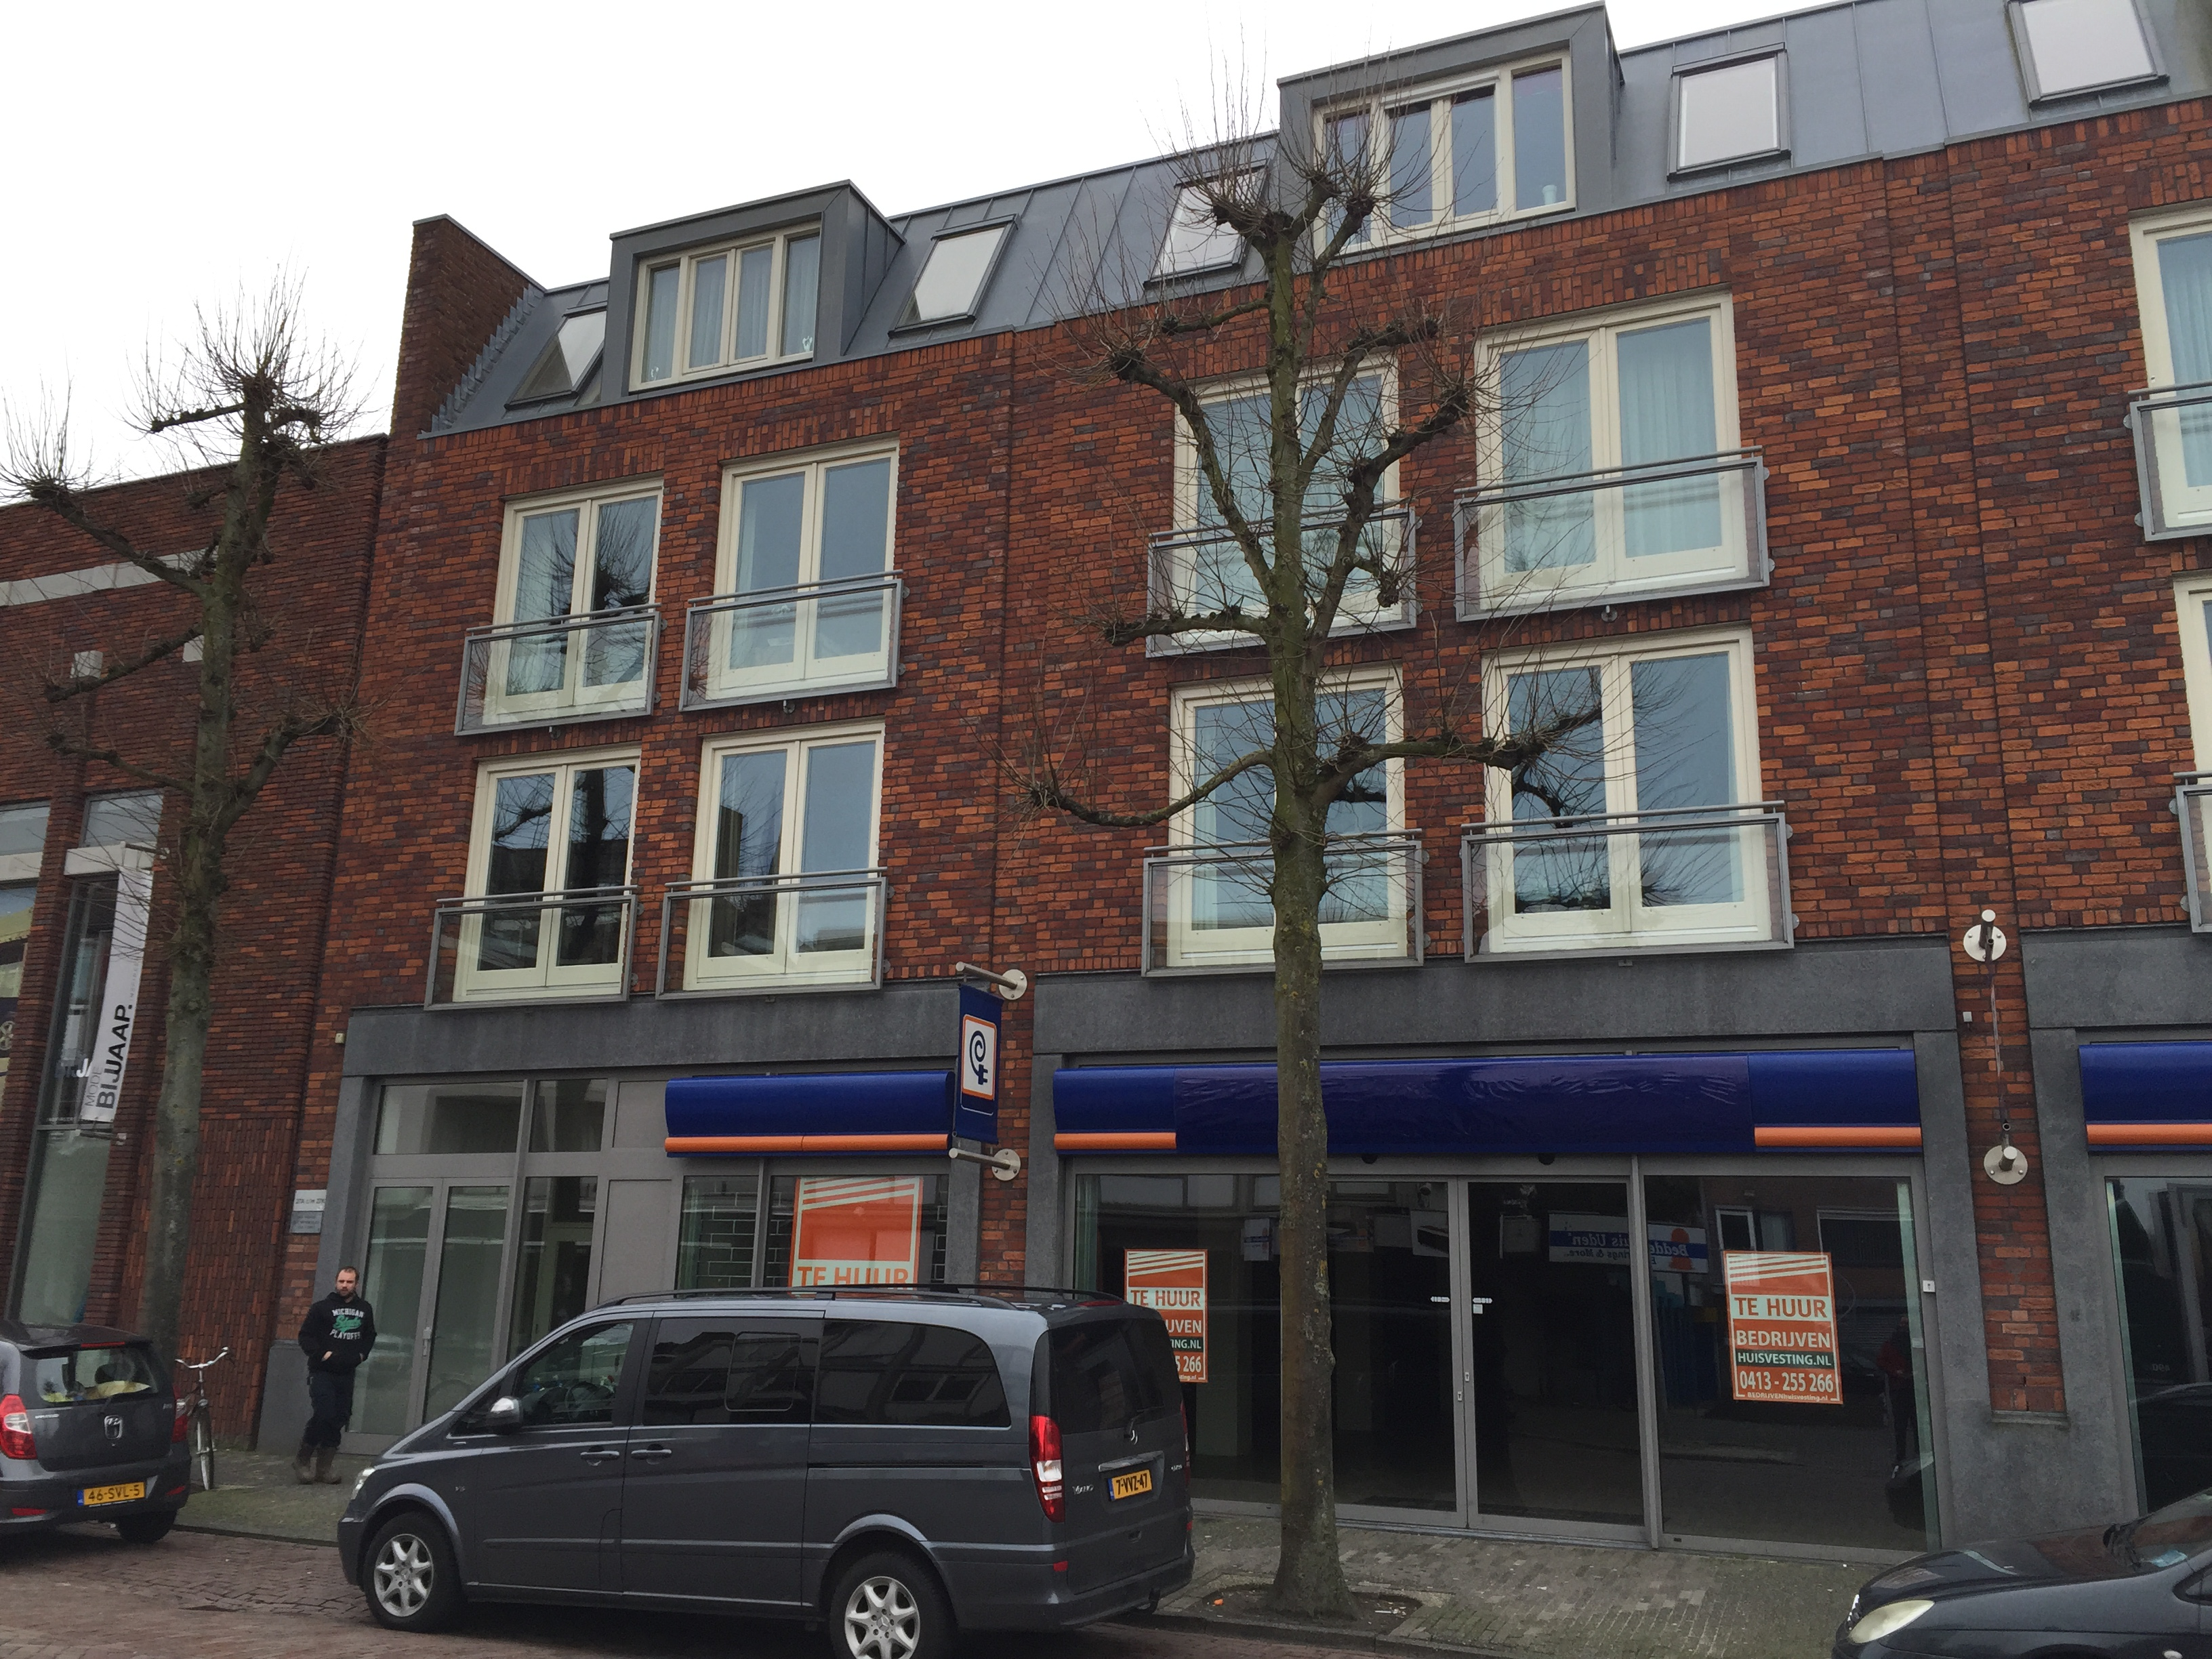 Mondriaan in Brabant – willemvanzeeland